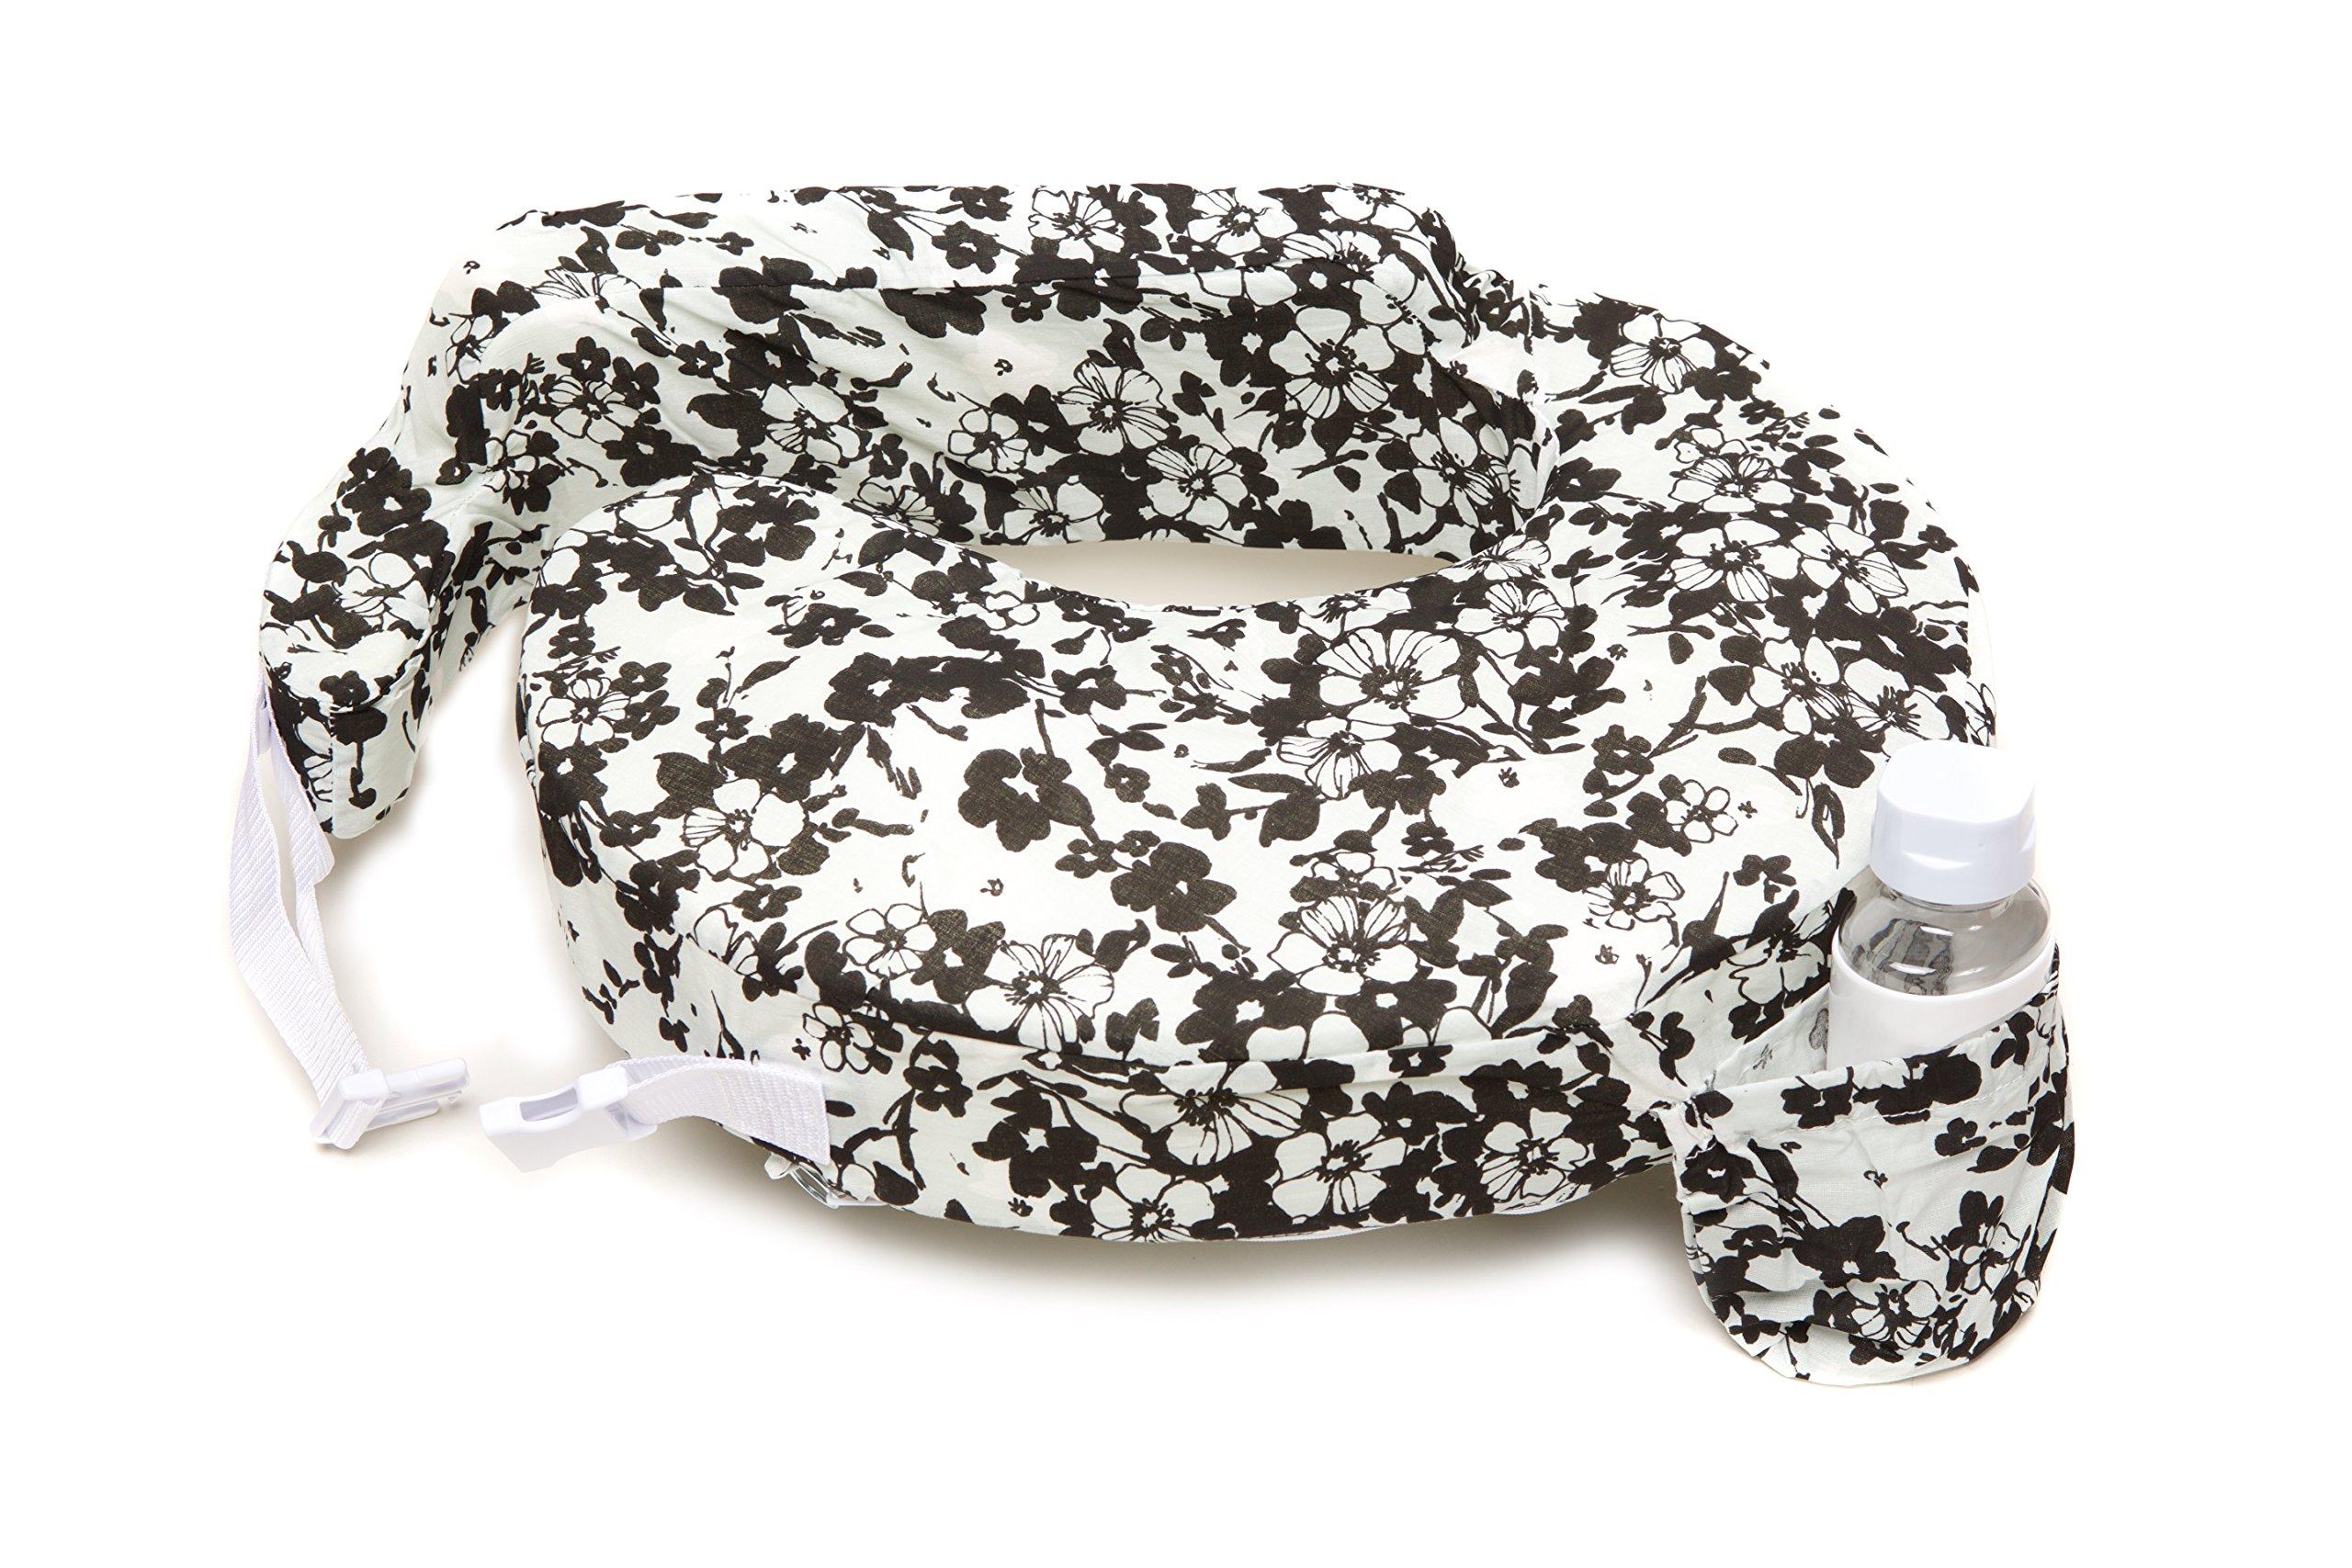 Zenoff Products Nursing Pillow Slipcover, Evening Bloom, Grey, White, Black